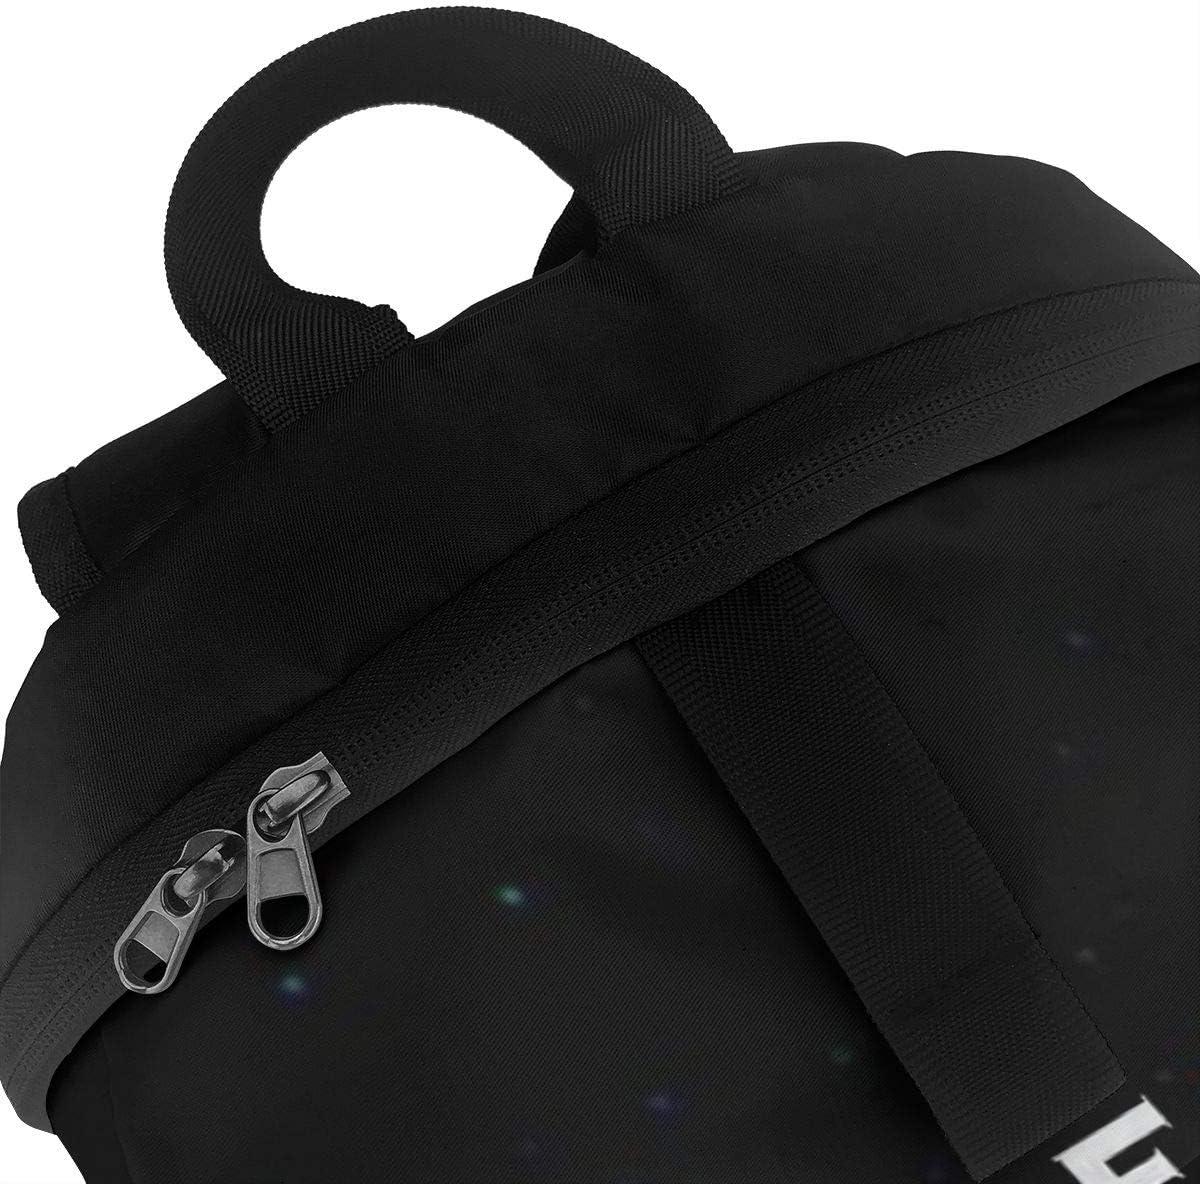 Sherrygeoffrey The Joe Rogan Experience Bookbag Student Bag Shoulder Backpack Laptop Bag